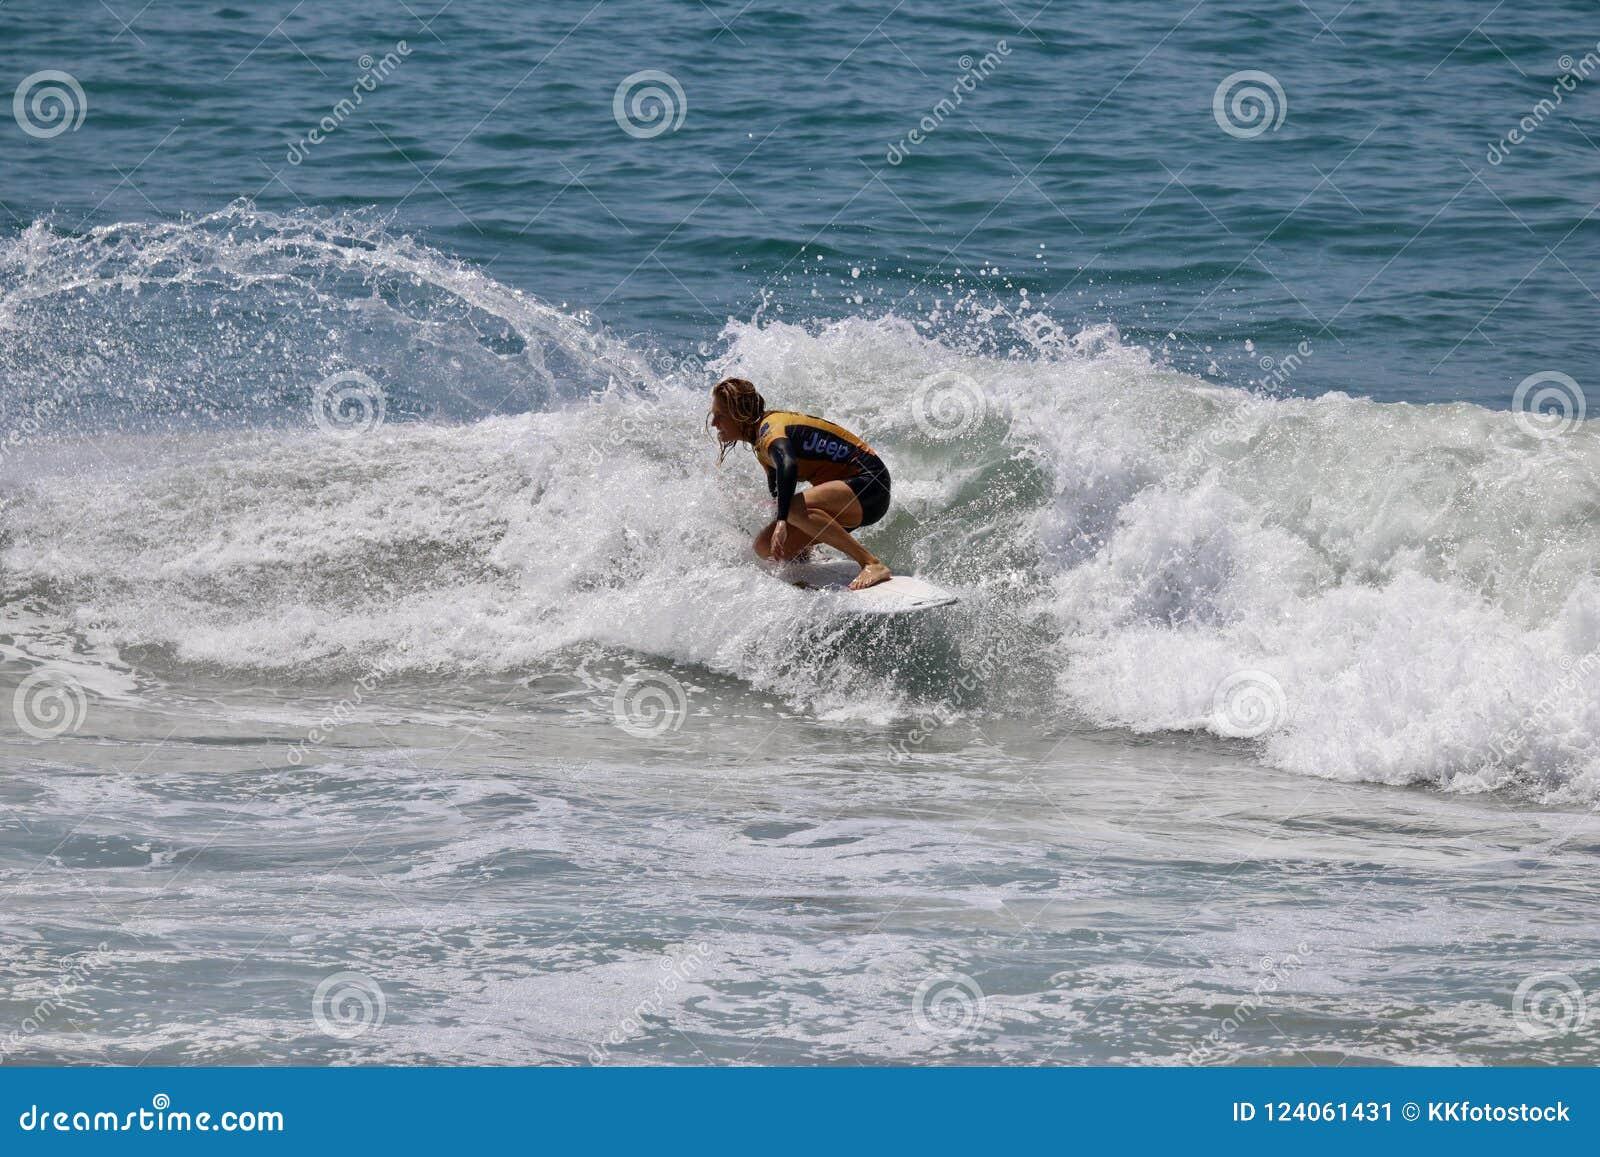 Surfboard Surfing Bodyboarding Quiksilver, surfing, leaf, sports, billabong  png | Klipartz